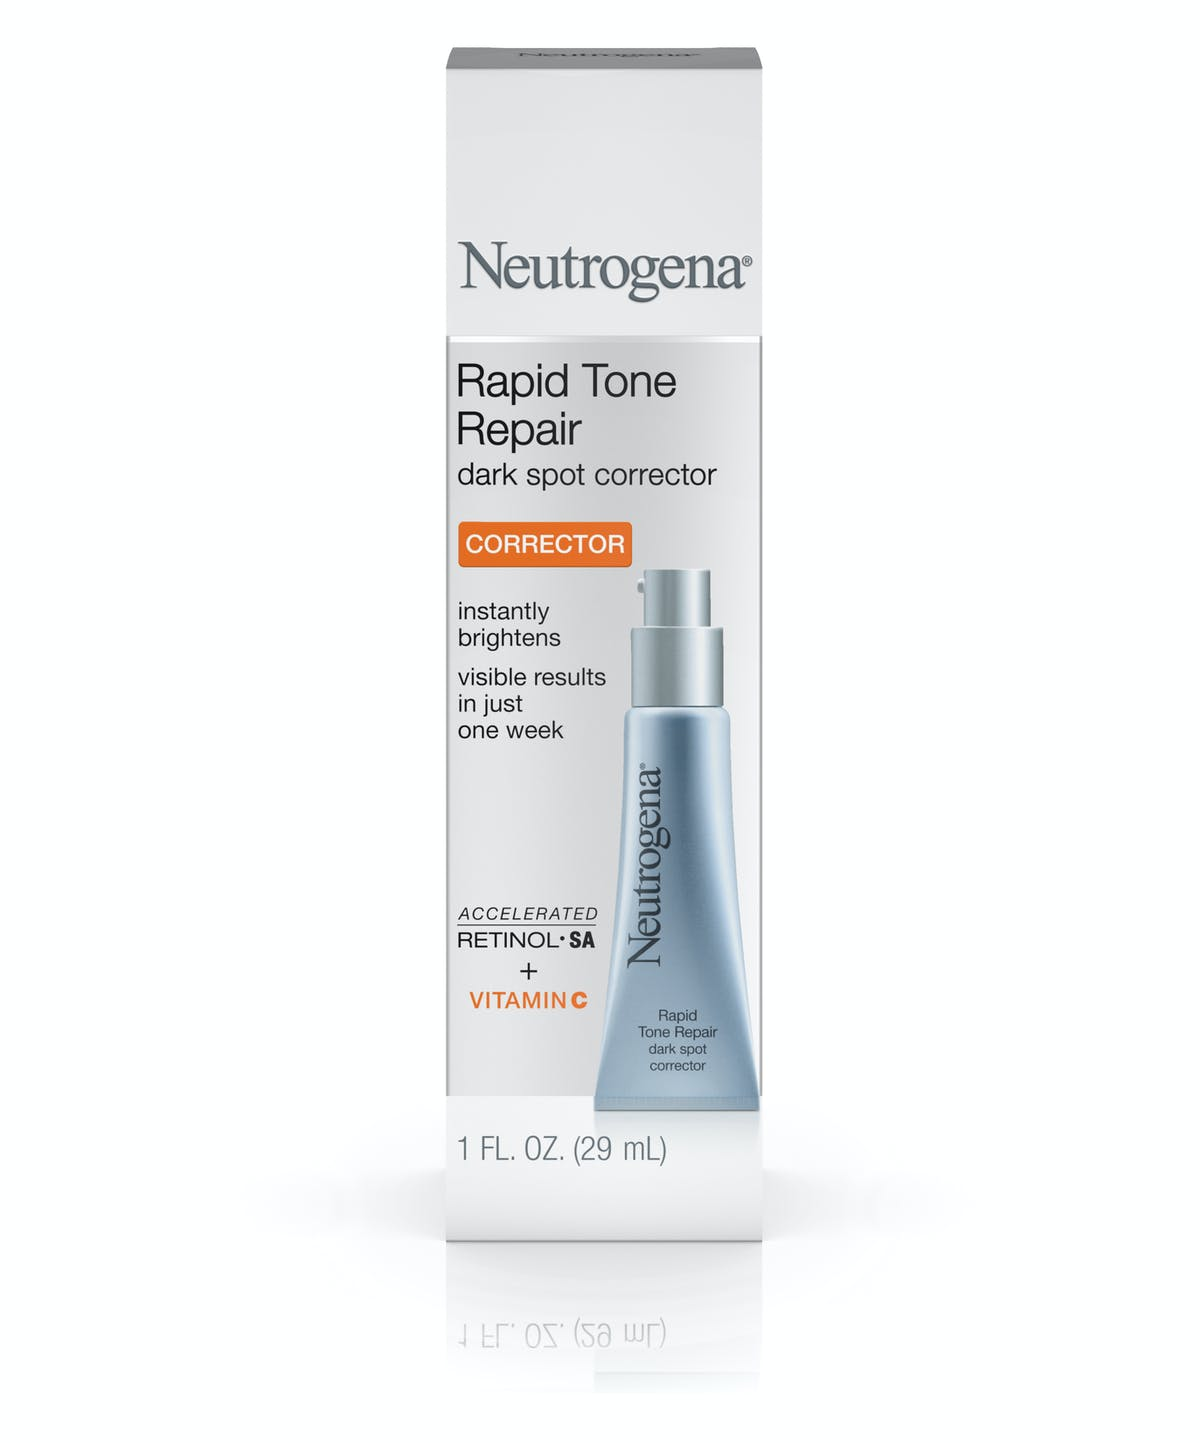 Neutrogena® Rapid Tone Repair Dark Spot Corrector